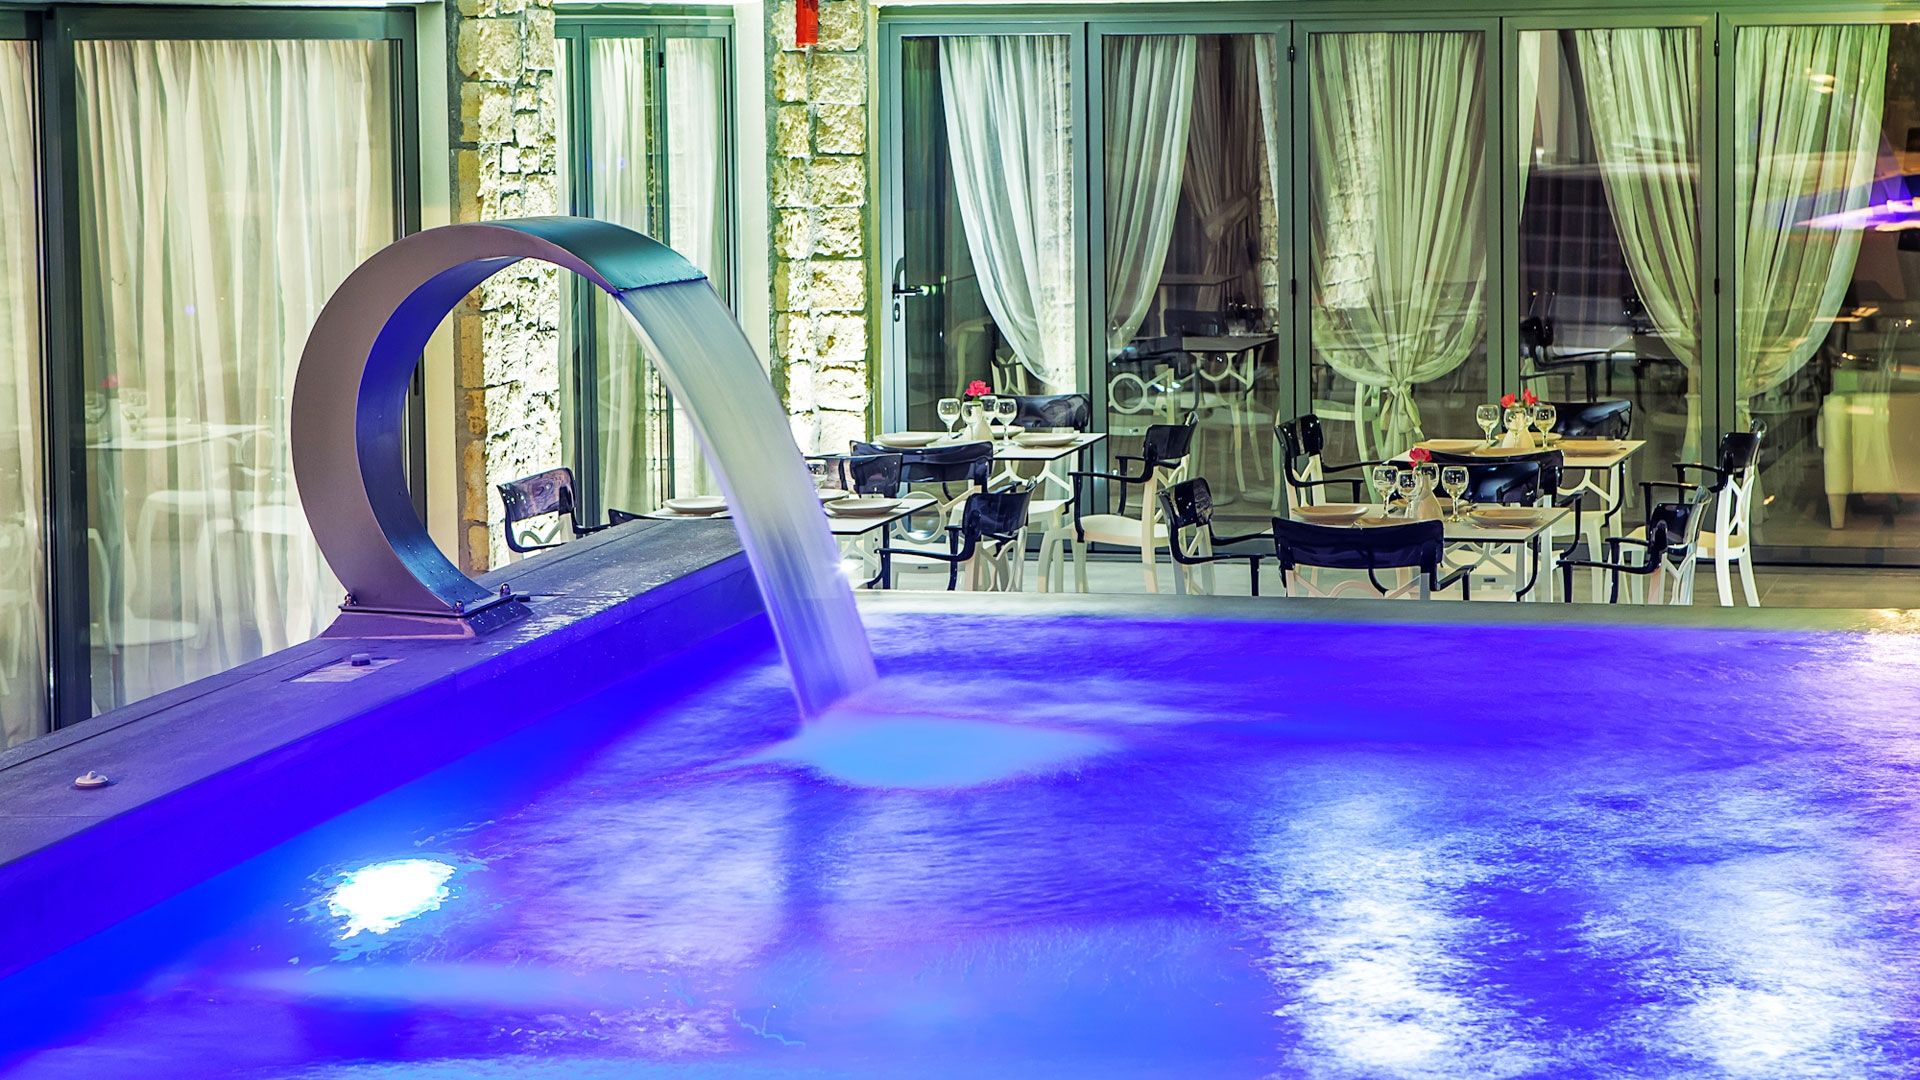 Core Hotels - Πολύχρονο Χαλκιδικής ✦ -20% ✦ 3 Ημέρες